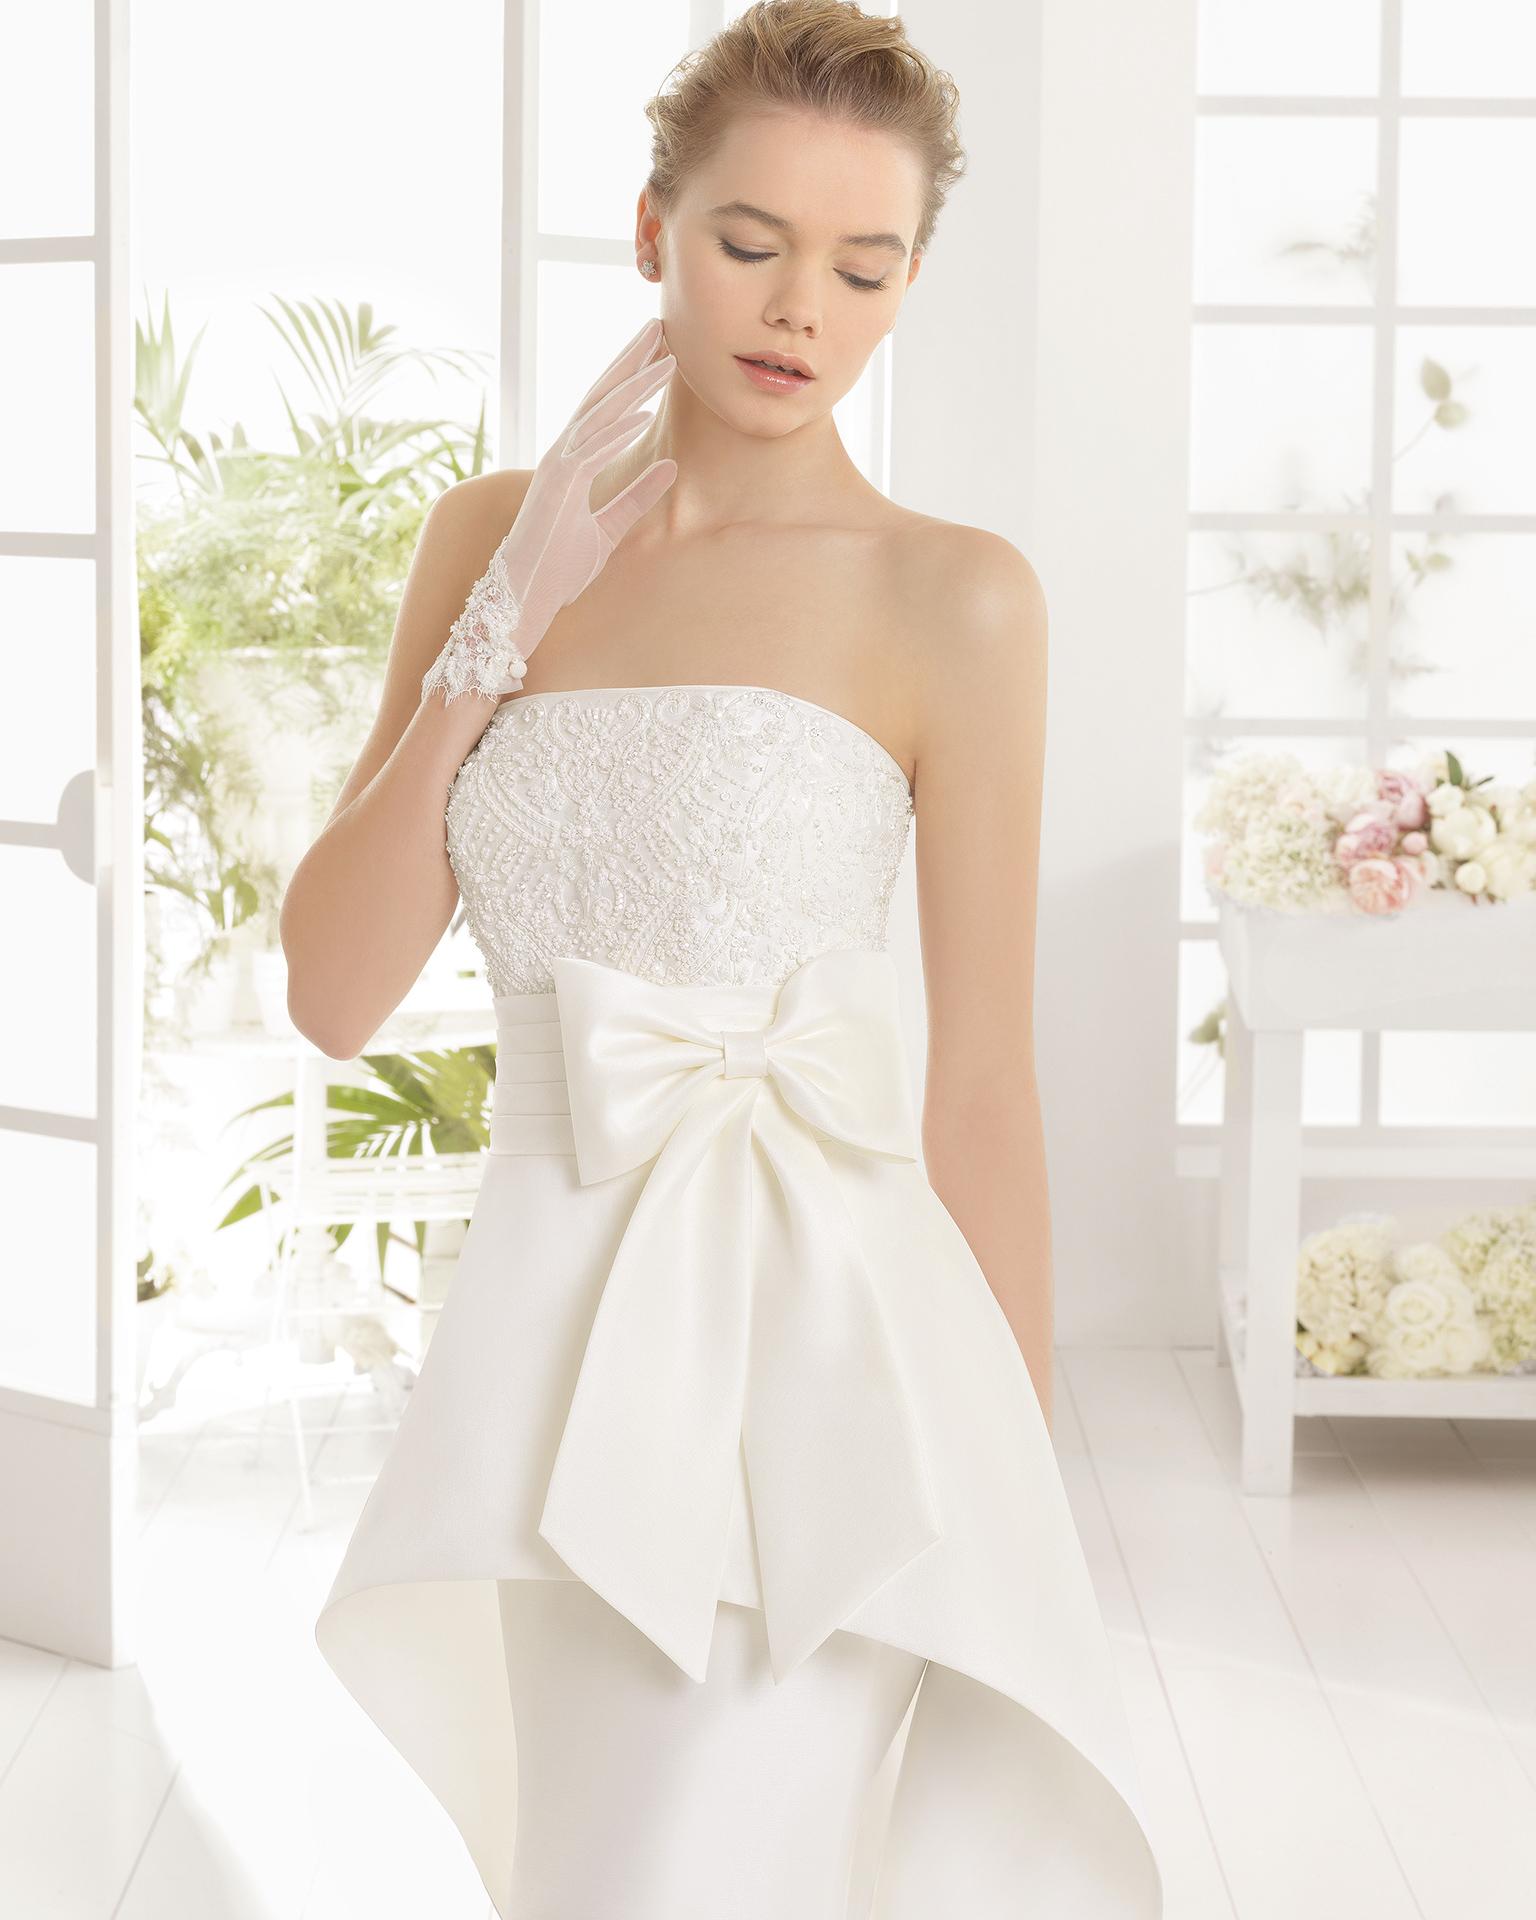 MENINA Hochzeitskleid - Aire Barcelona 2016.